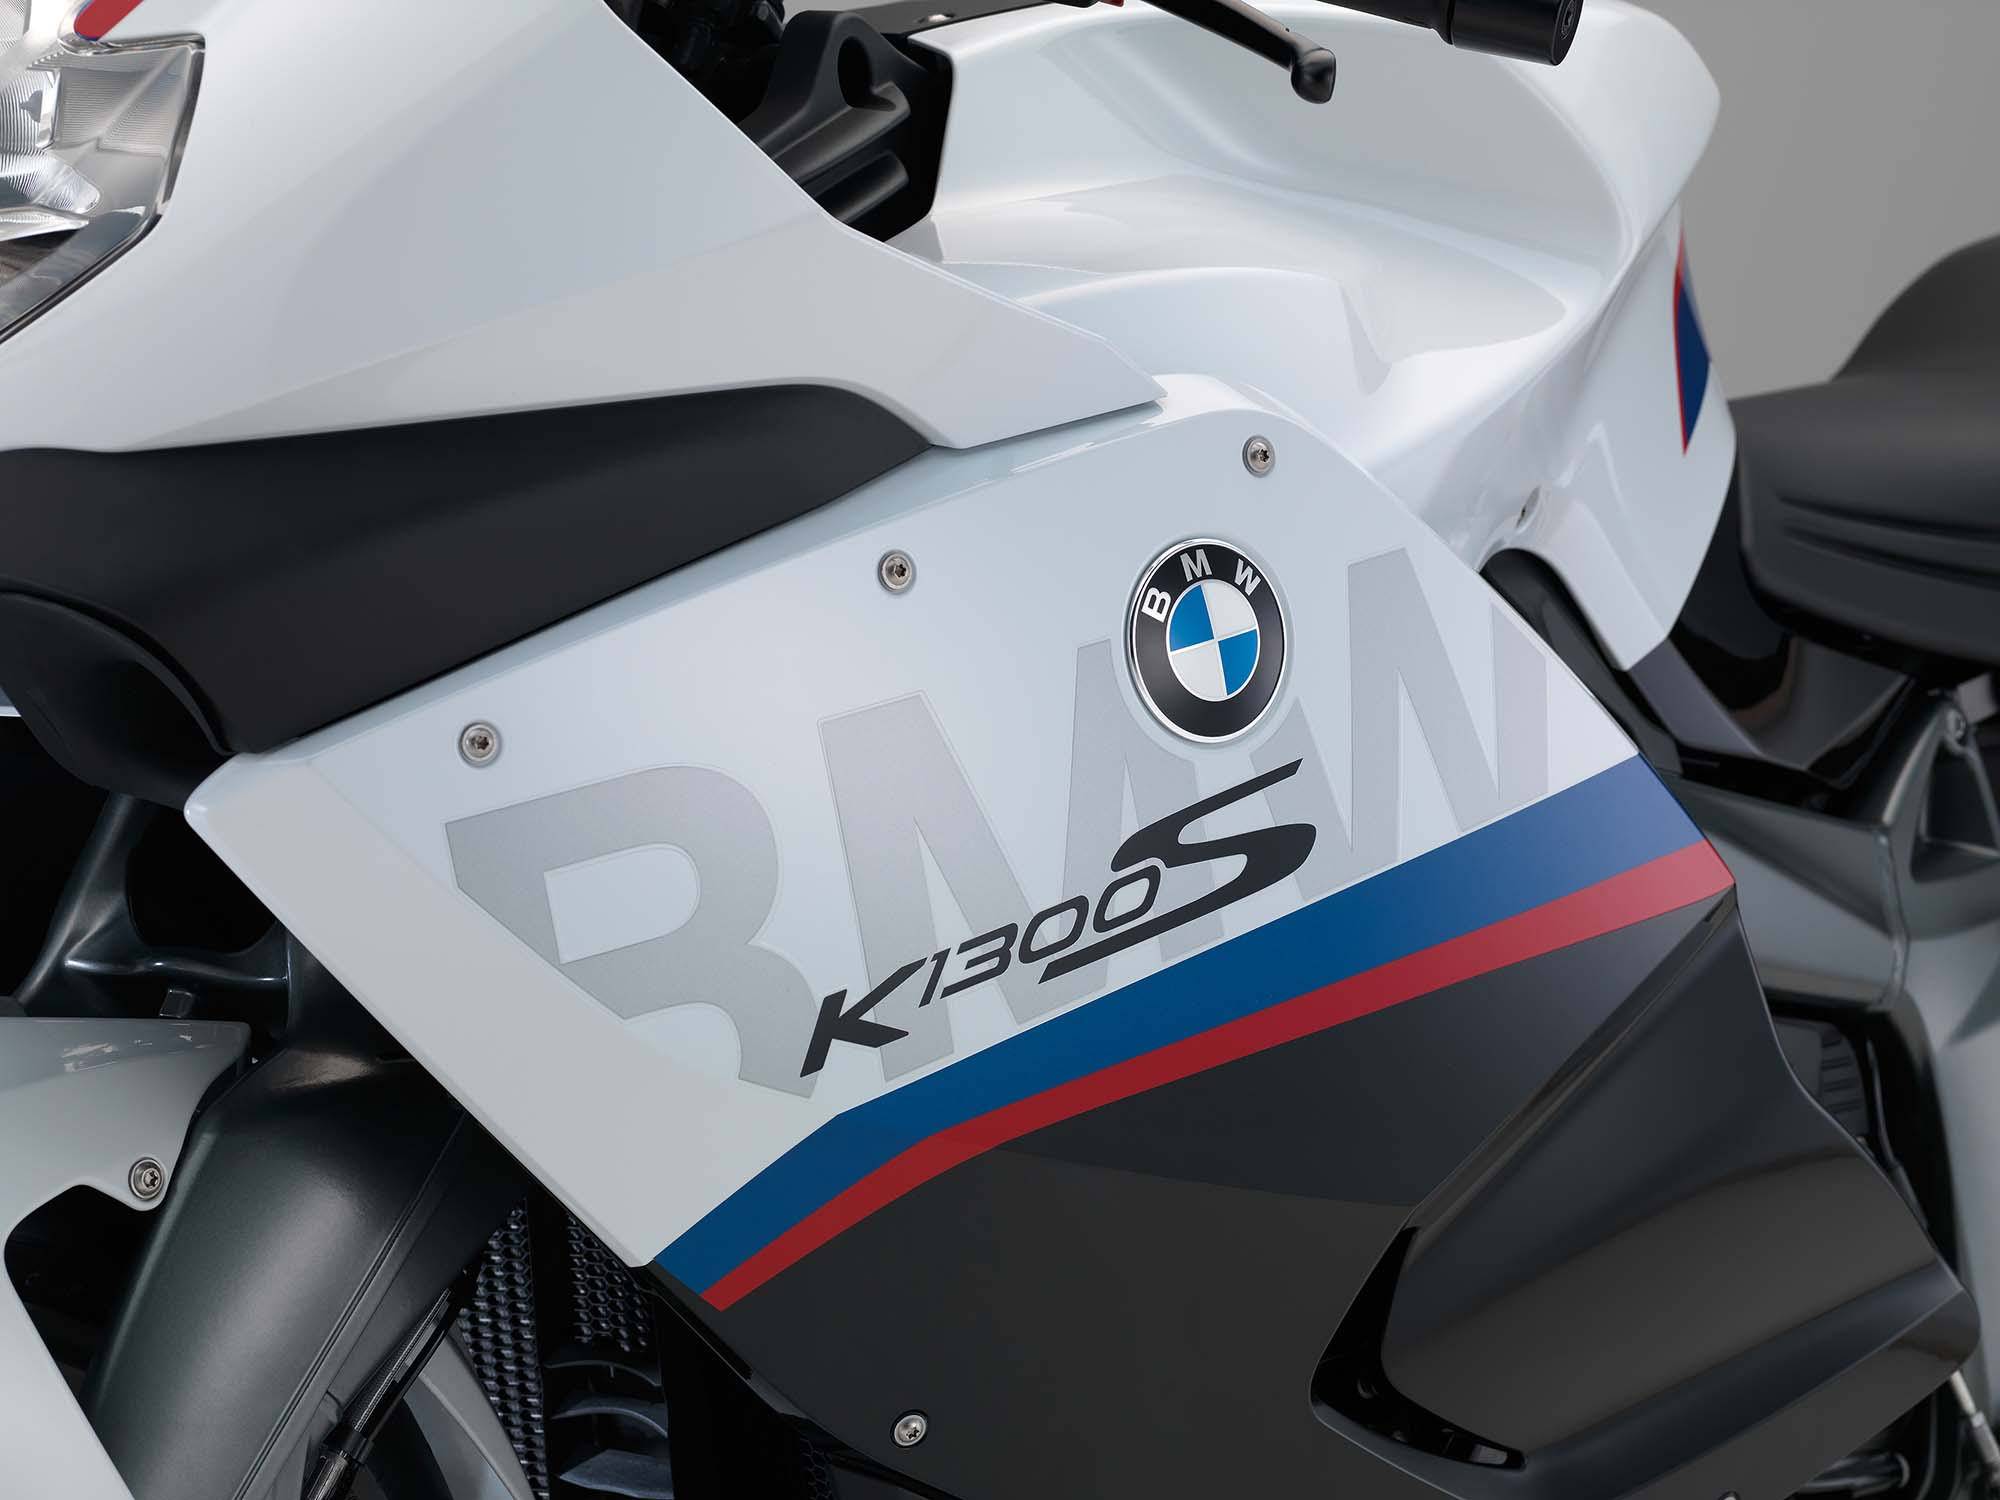 http://i0.wp.com/www.asphaltandrubber.com/wp-content/uploads/2014/07/2015-BMW-K1300S-07.jpg